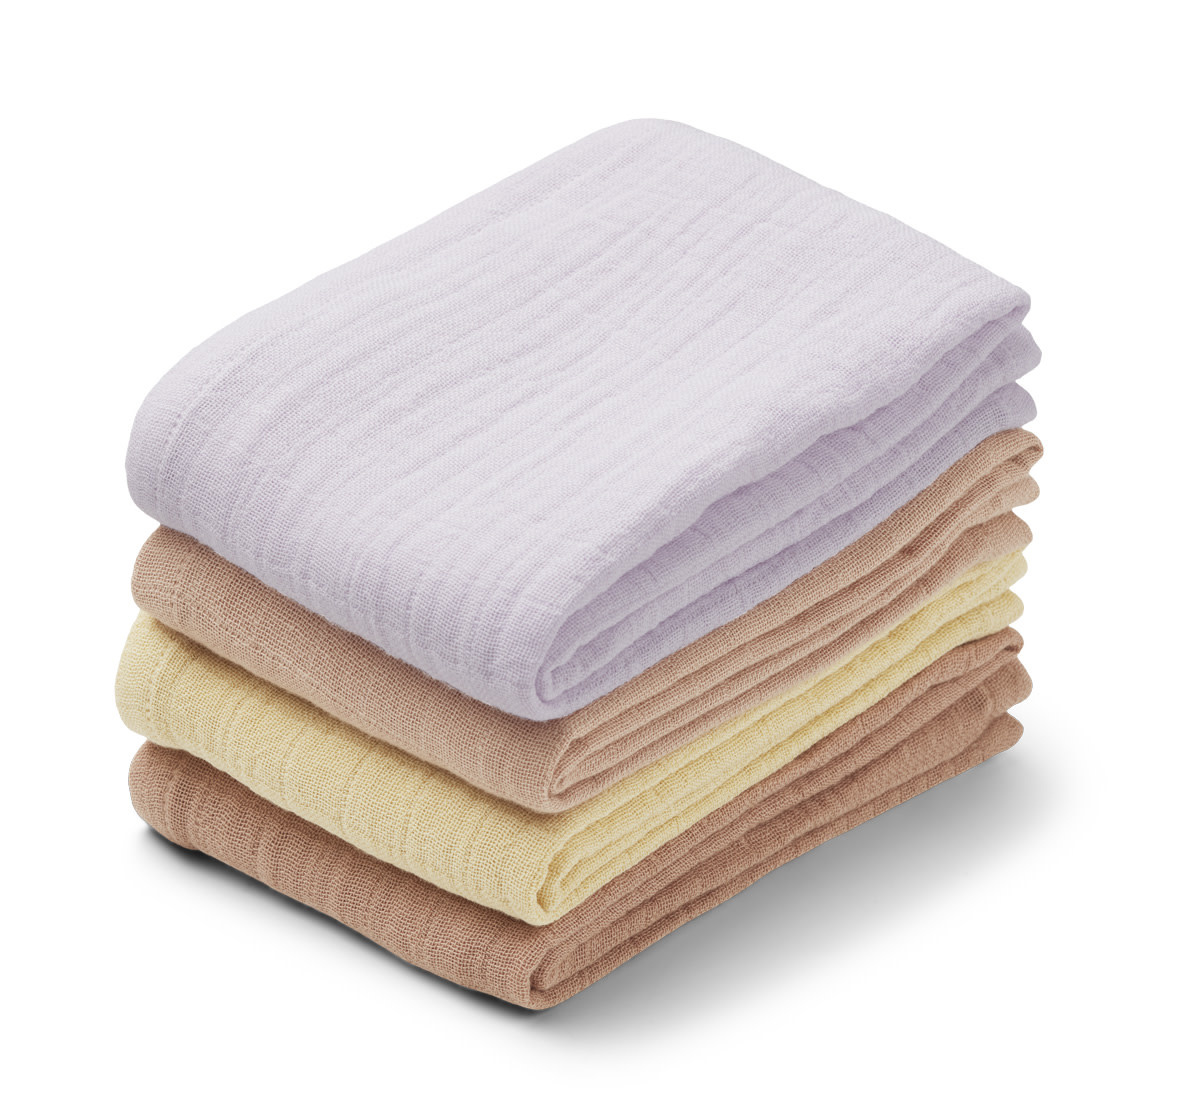 Leon muslin cloth light lavender multi mix - 4 pack-1